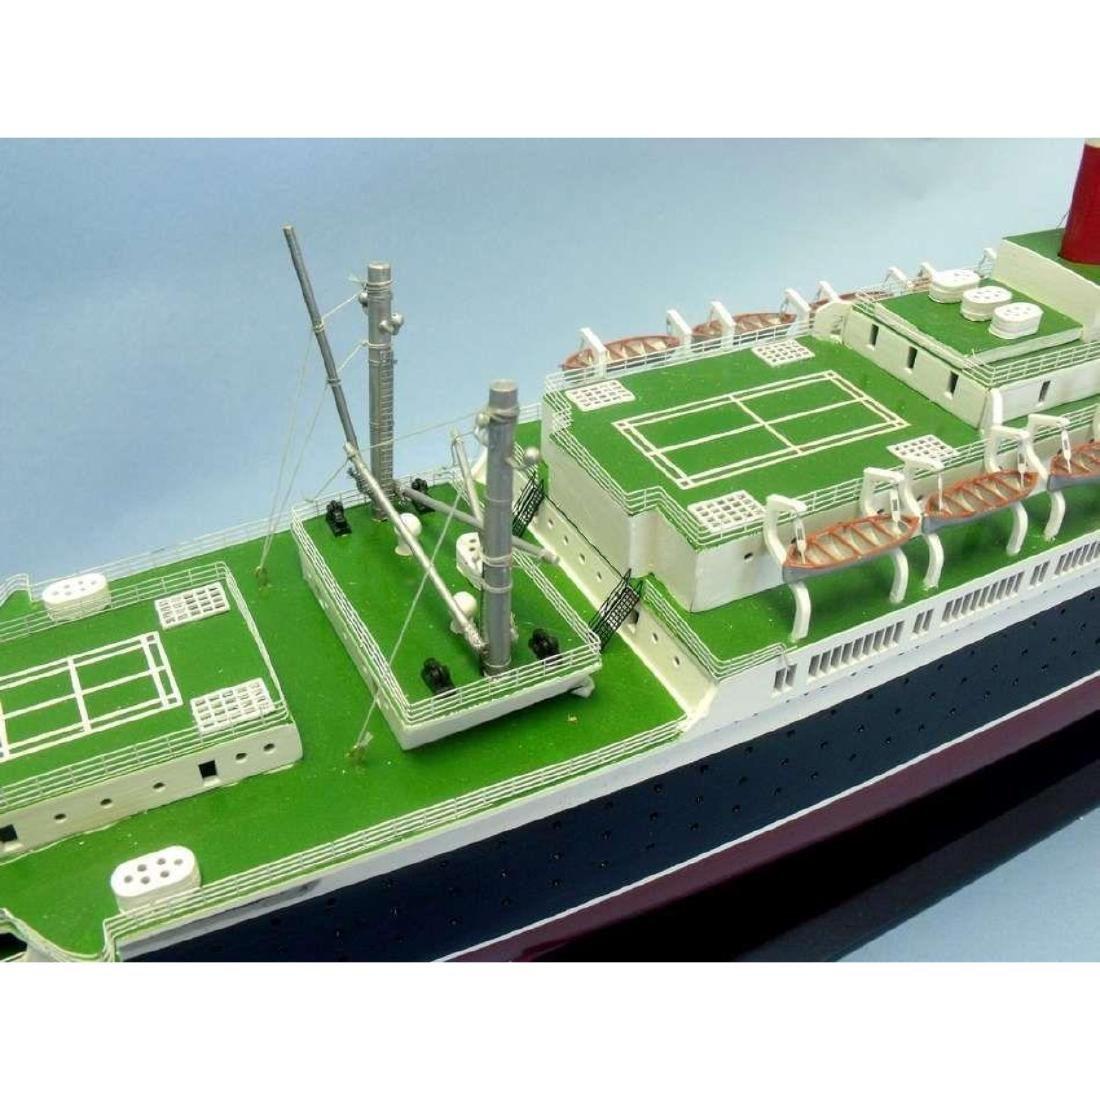 "SS United States Limited Model Cruise Ship 40"" w/ LED - 9"